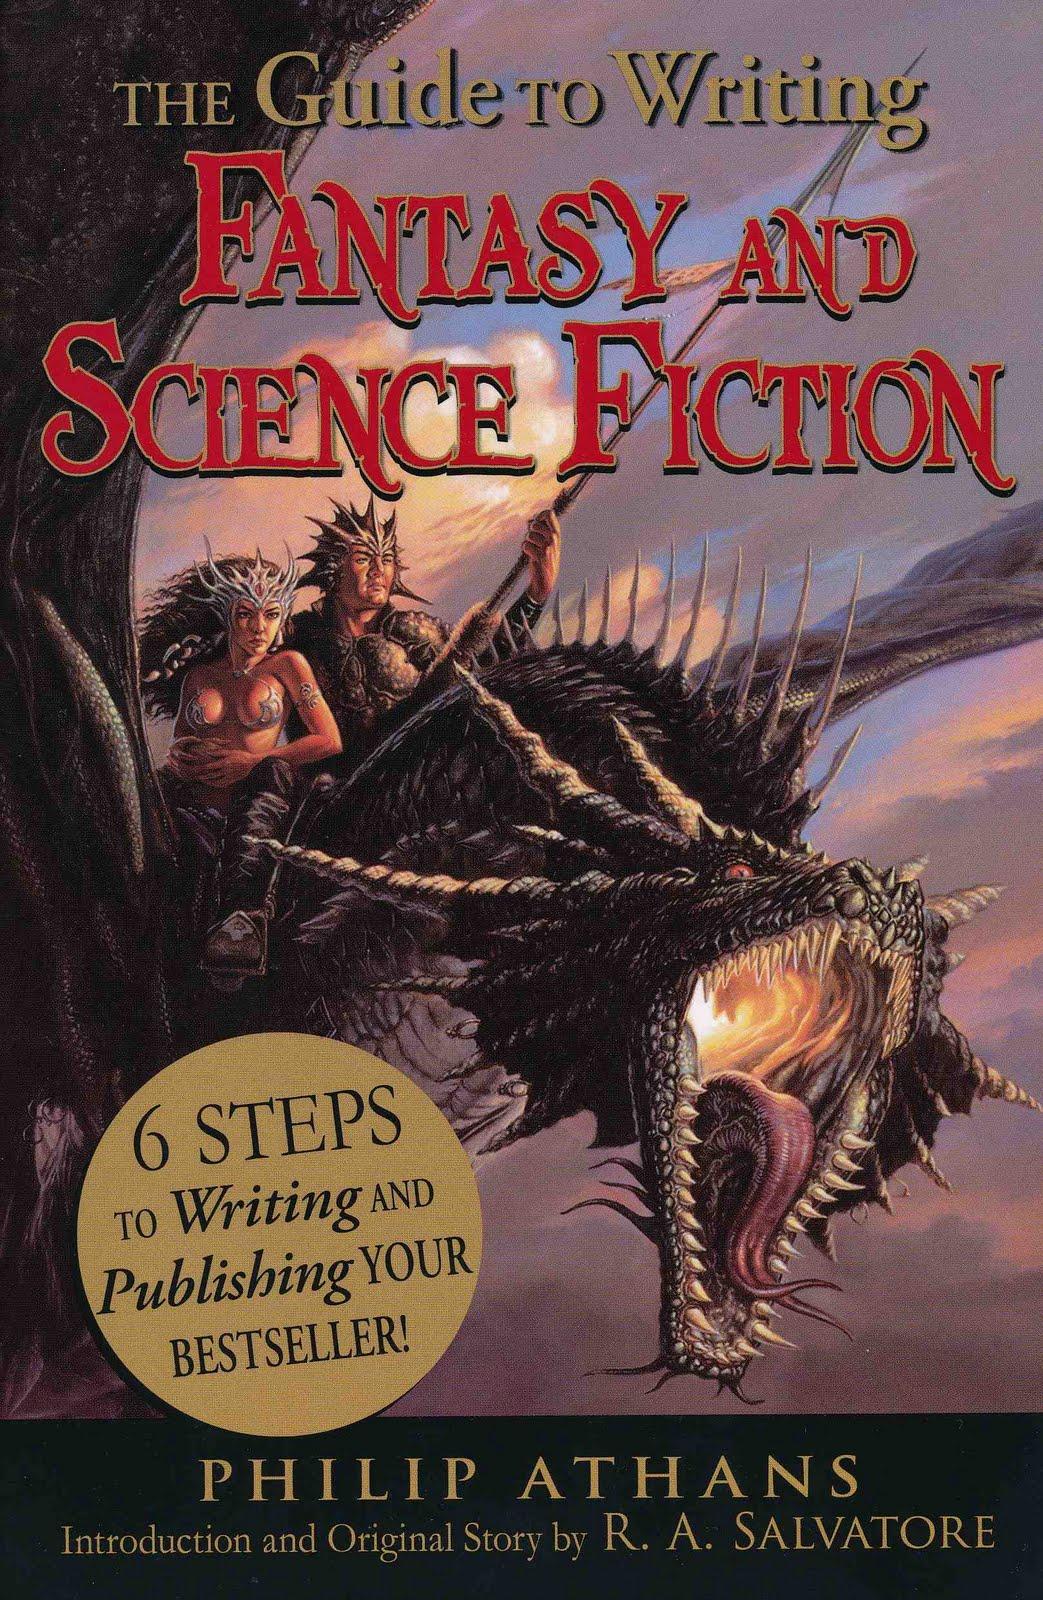 ... Asimov's Science Fiction Magazine Writing Science Fiction & Fantasy